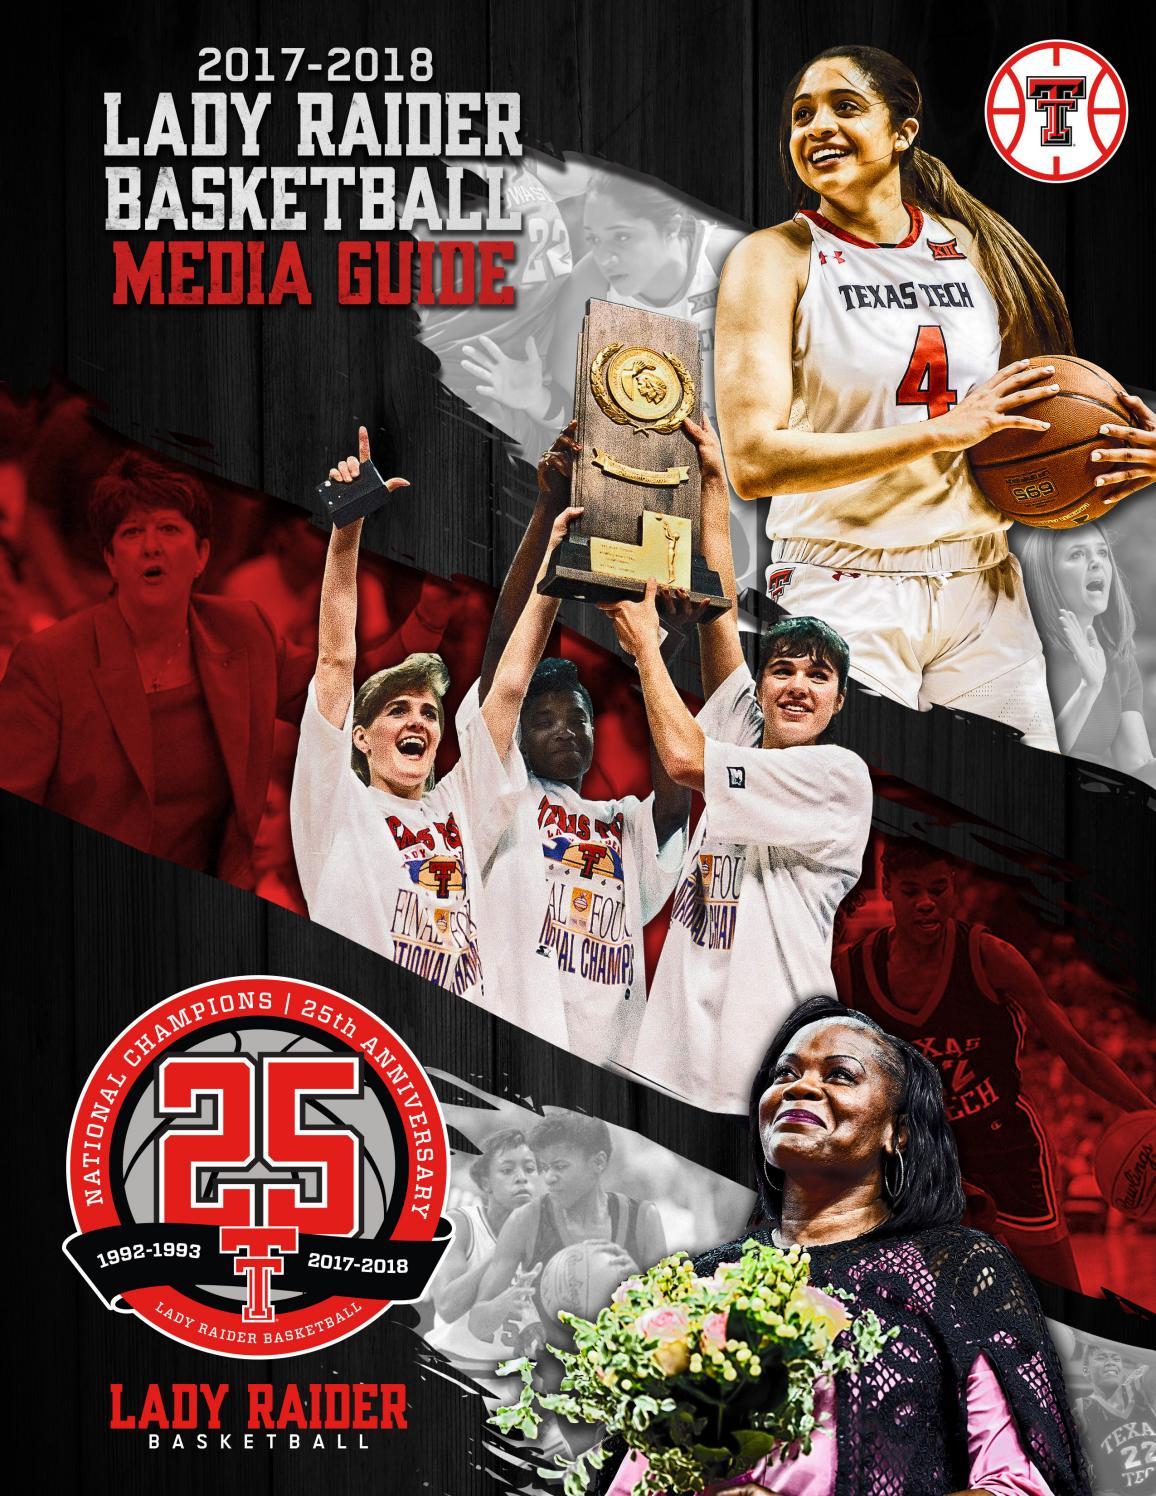 2017 18 Lady Raider Basketball Media Guide By Texastech Issuu League Volans K 440